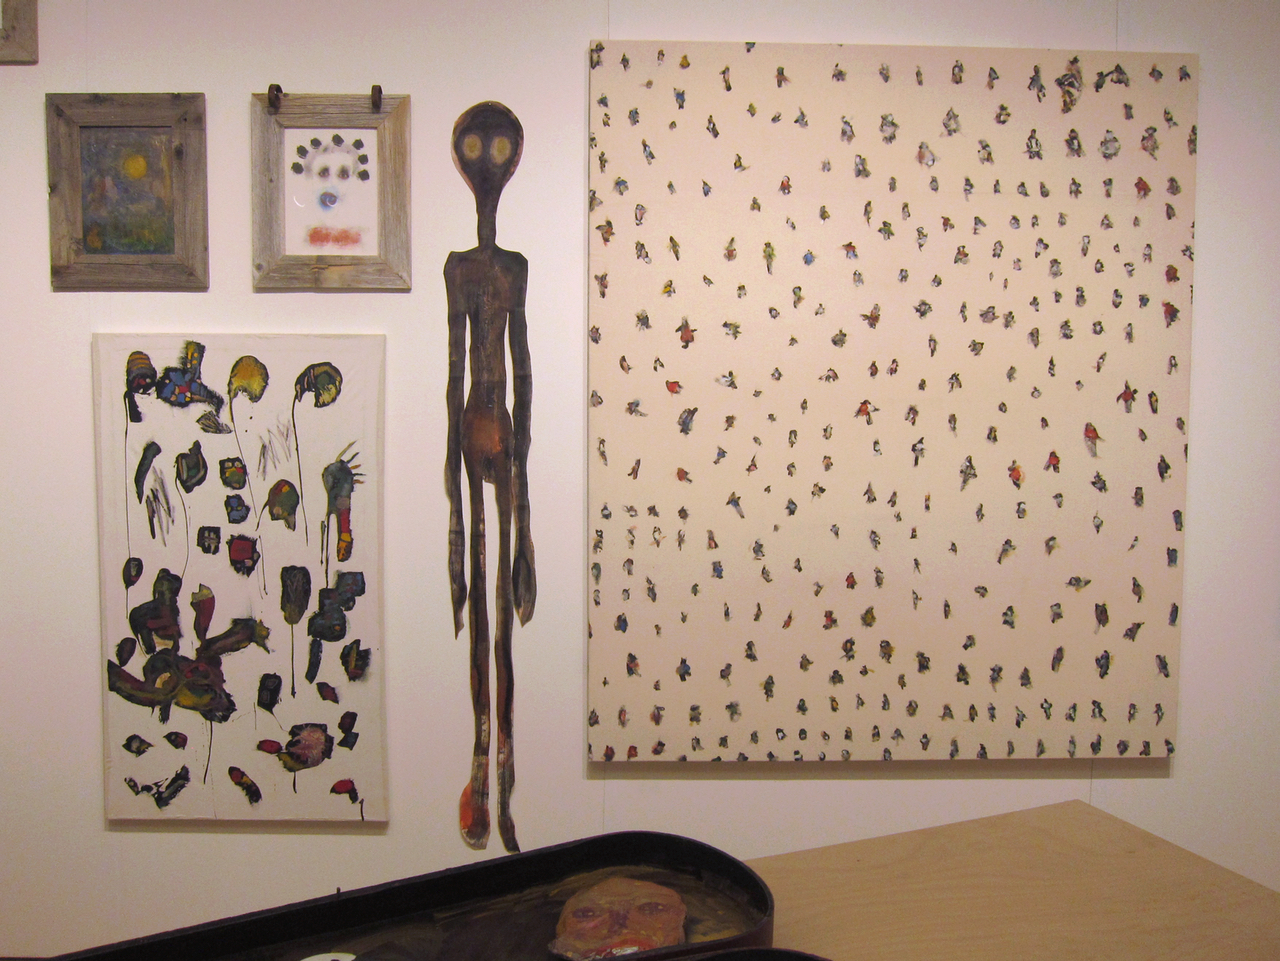 Works by Uman at Galerie Anne de Villepoix